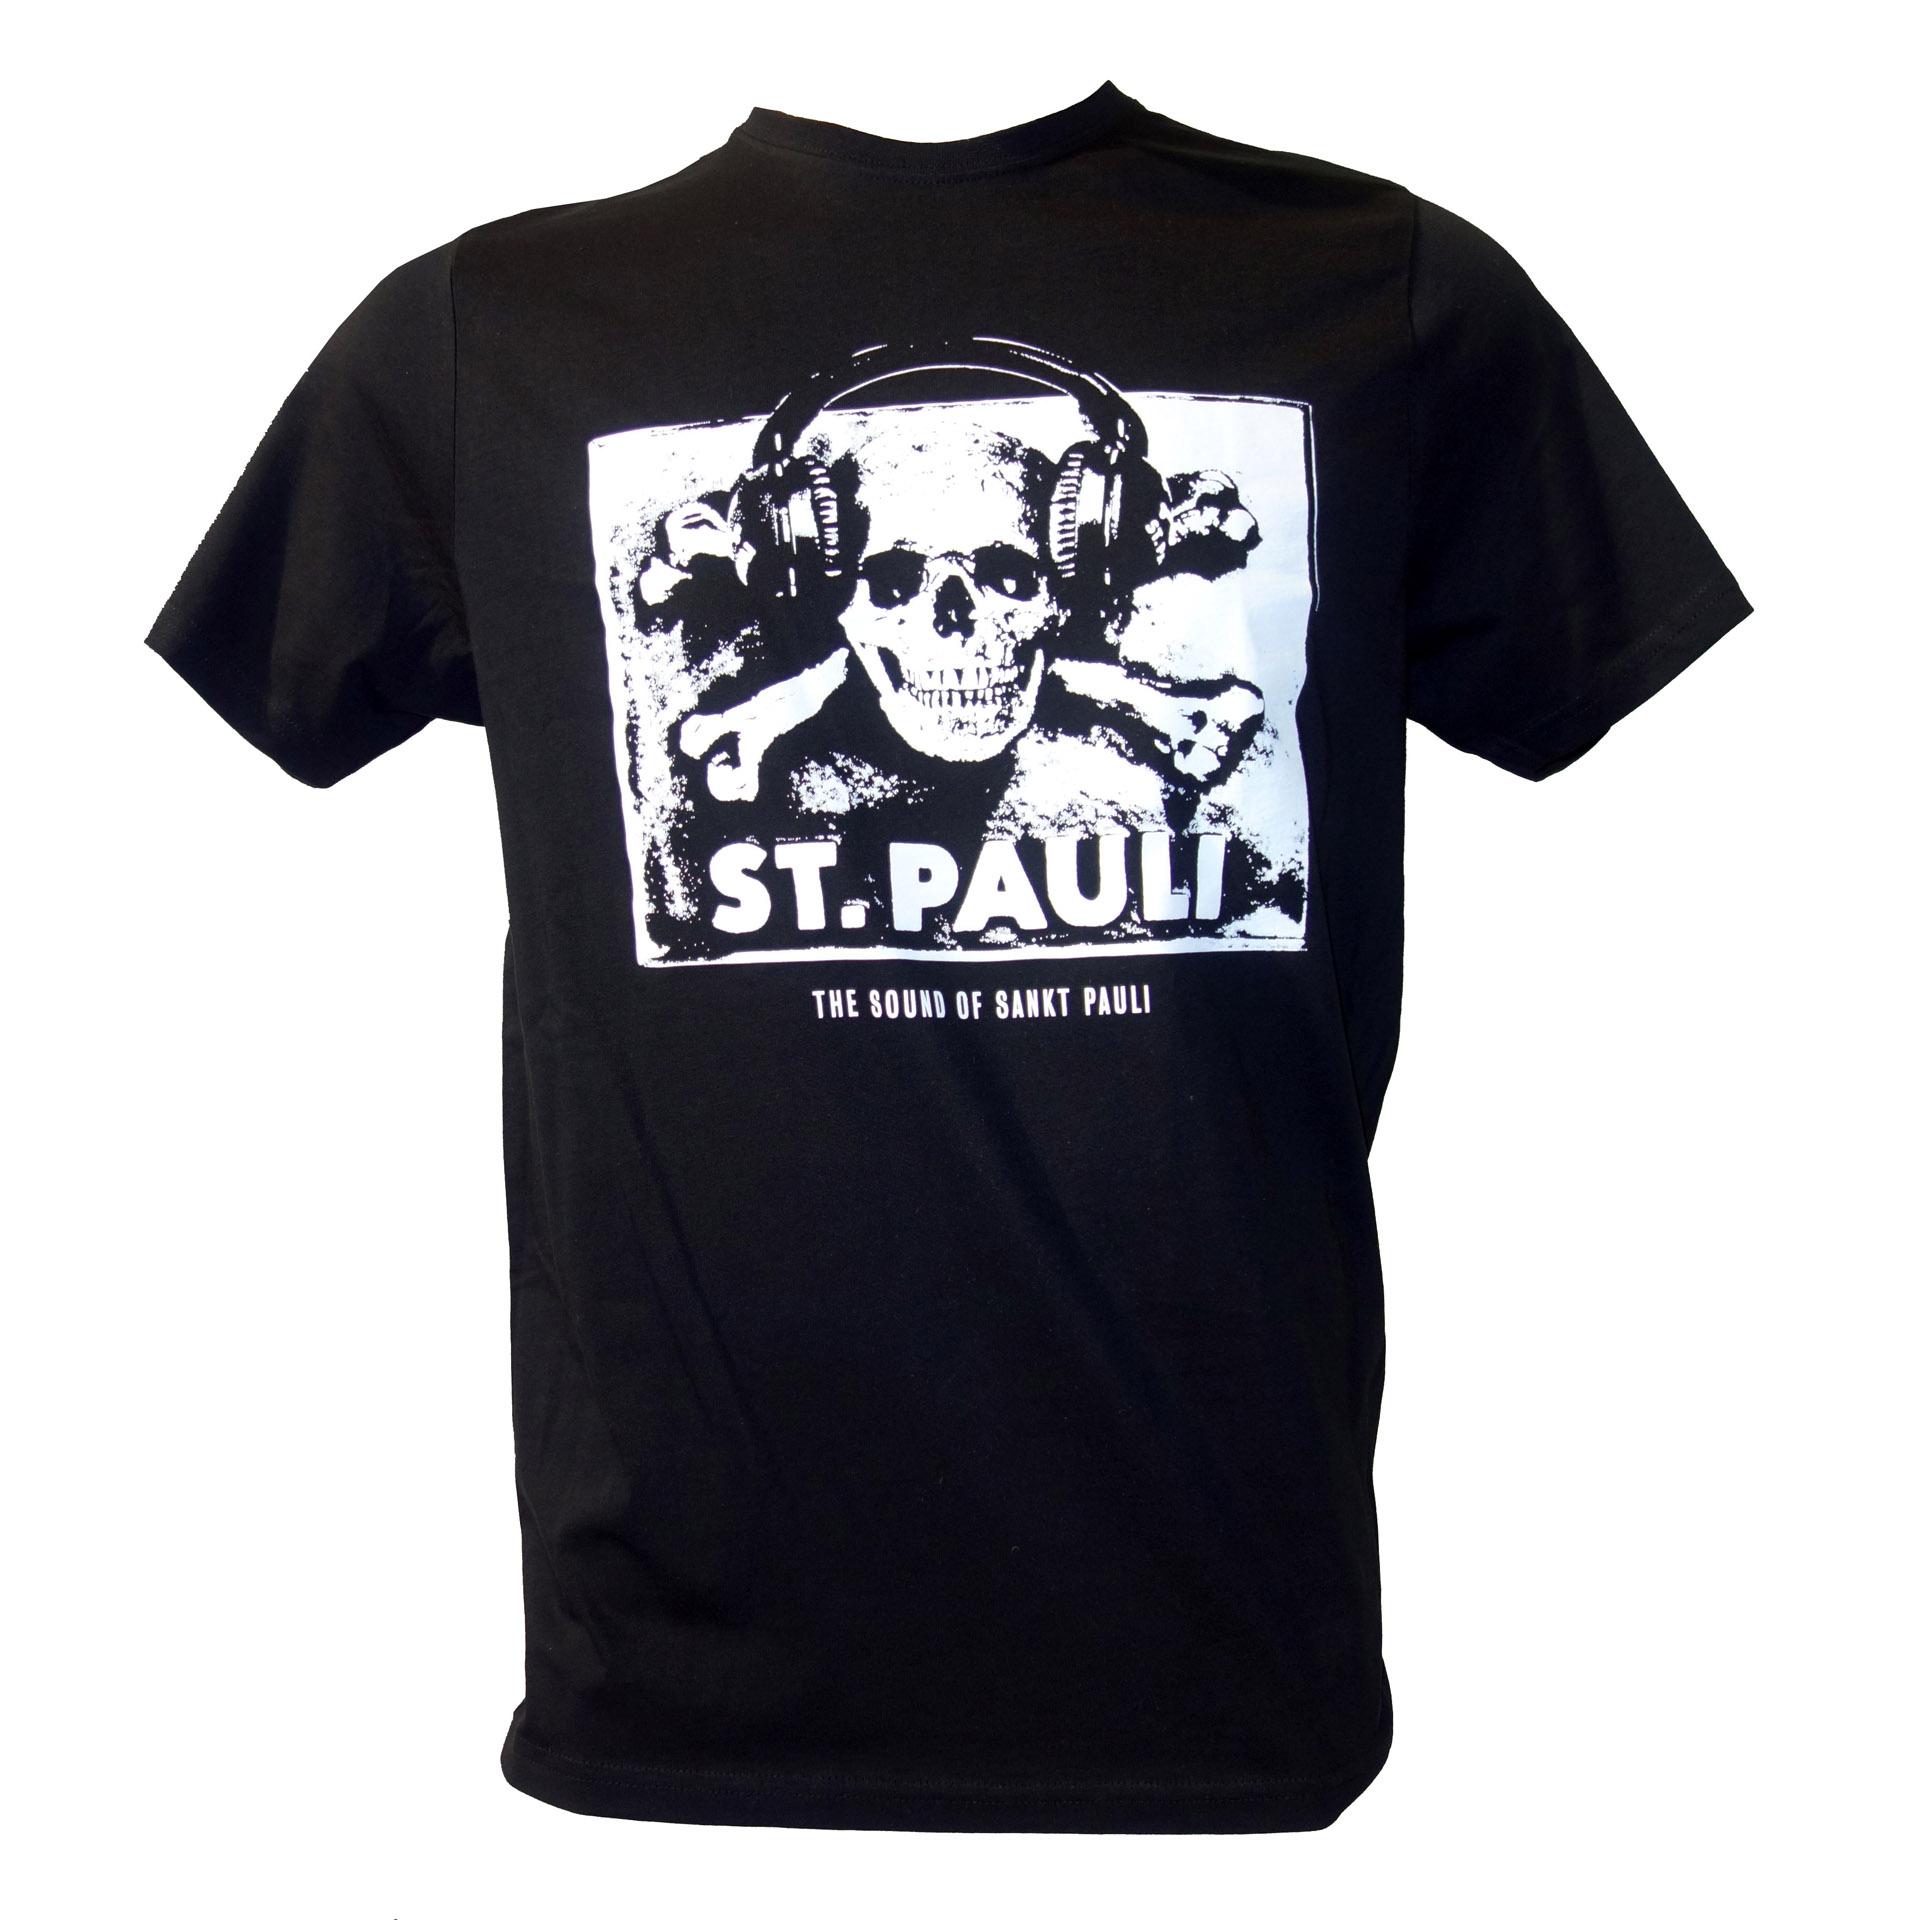 FC St. Pauli T-Shirt The Sound Of